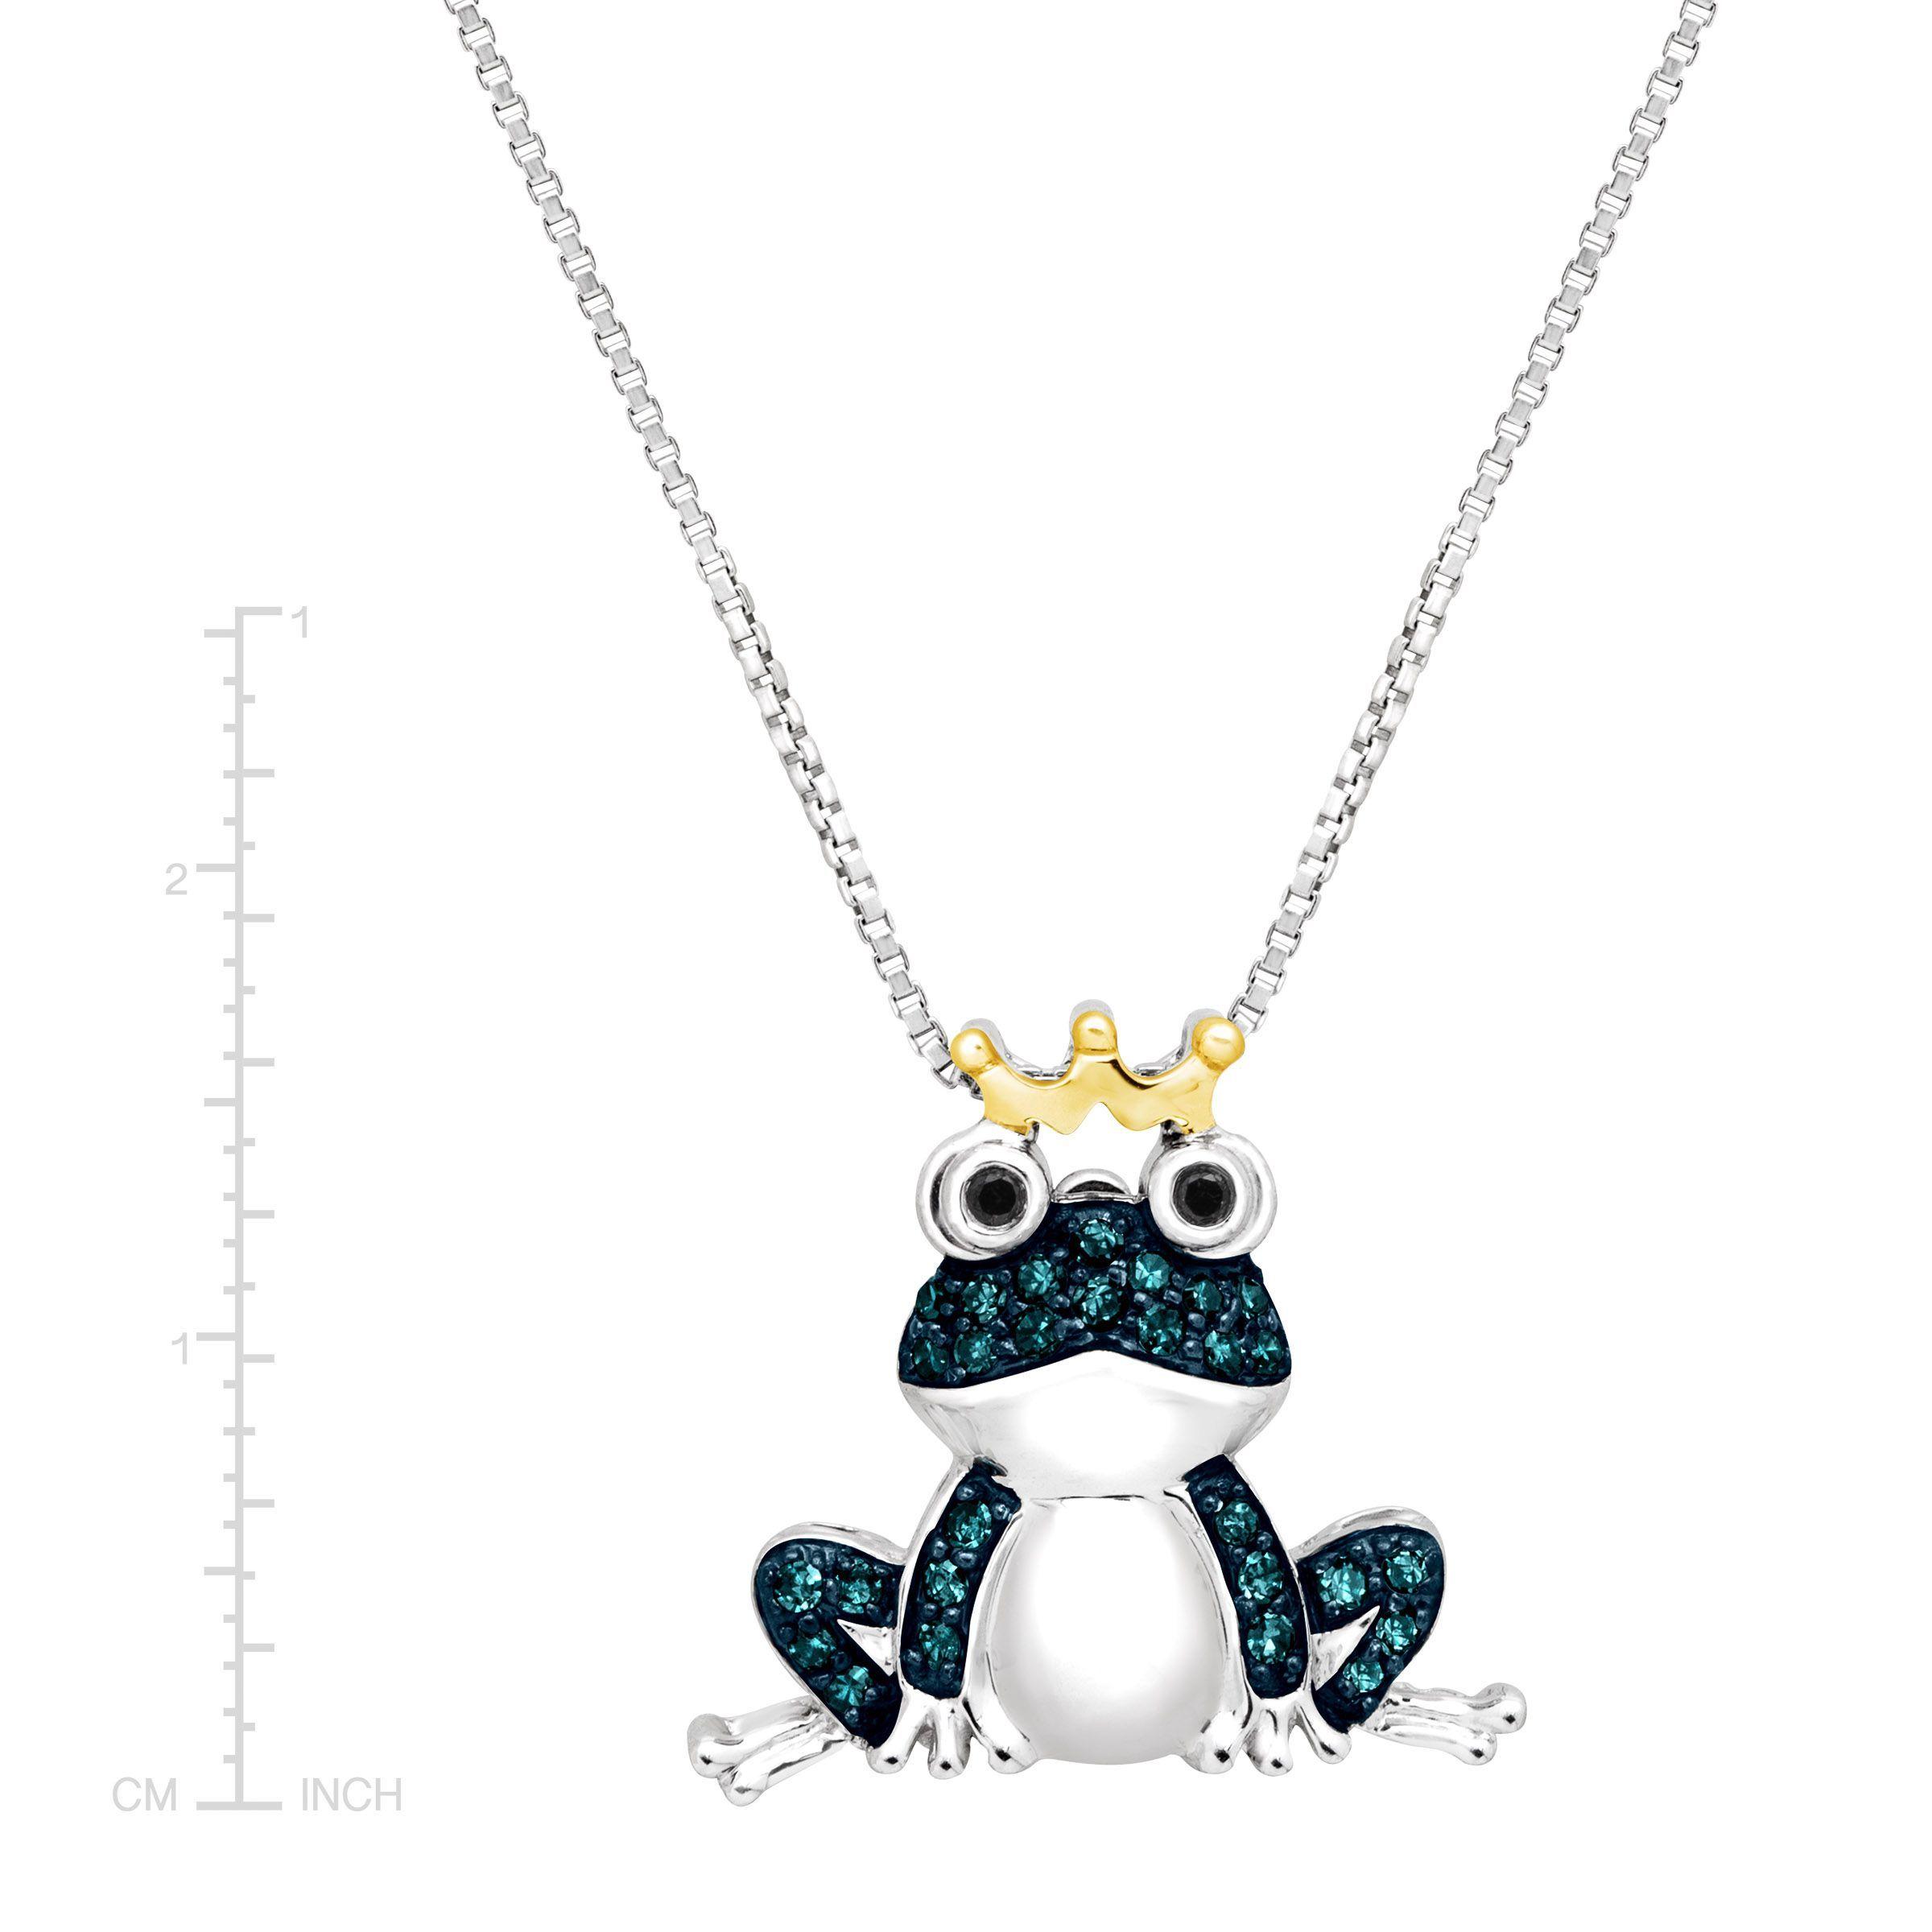 1 5 ct Blue & Black Diamond Frog Pendant in Sterling Silver & 14K